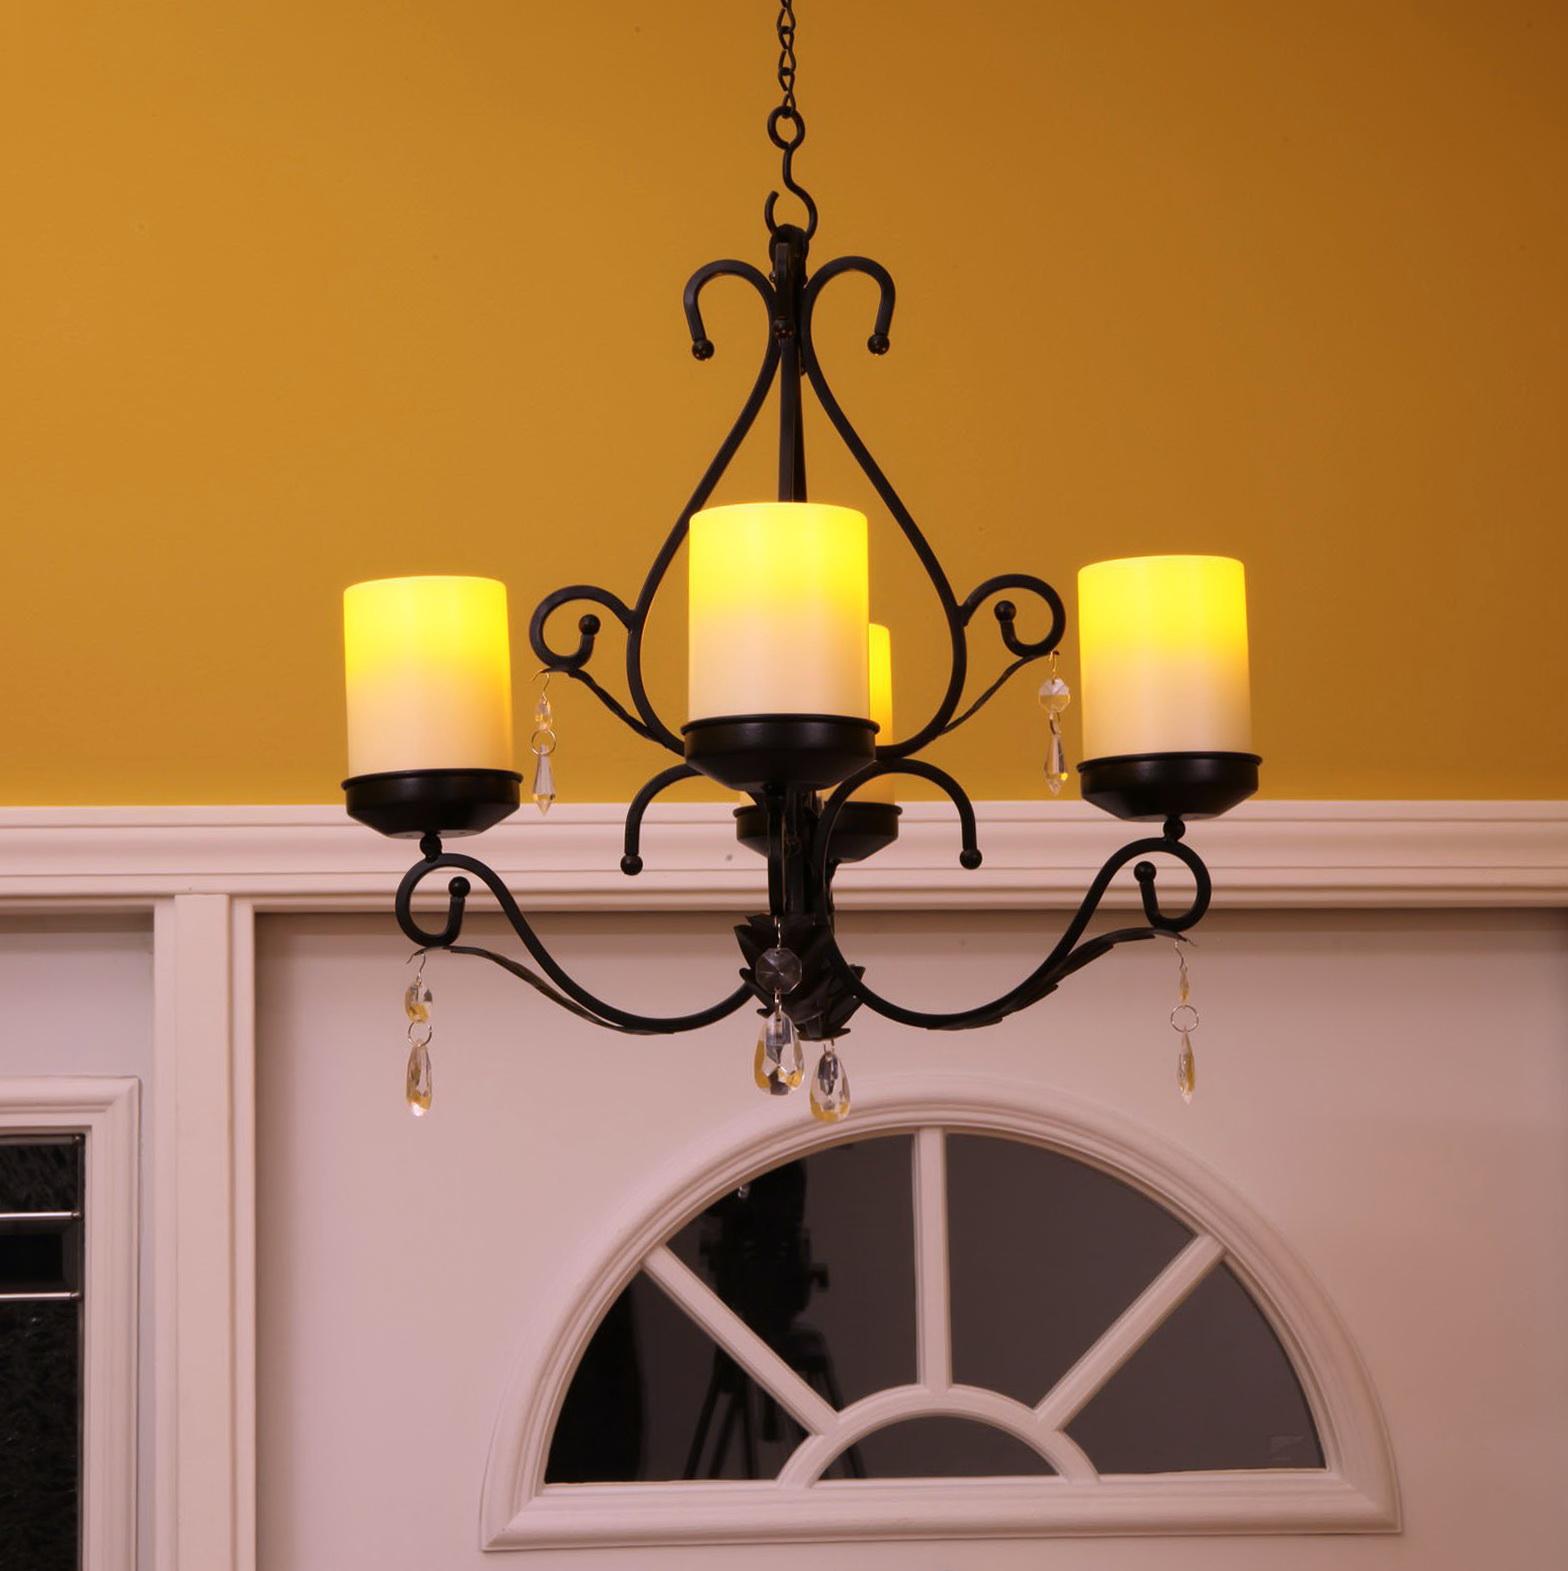 Outdoor Candle Chandelier Non Electric Home Design Ideas